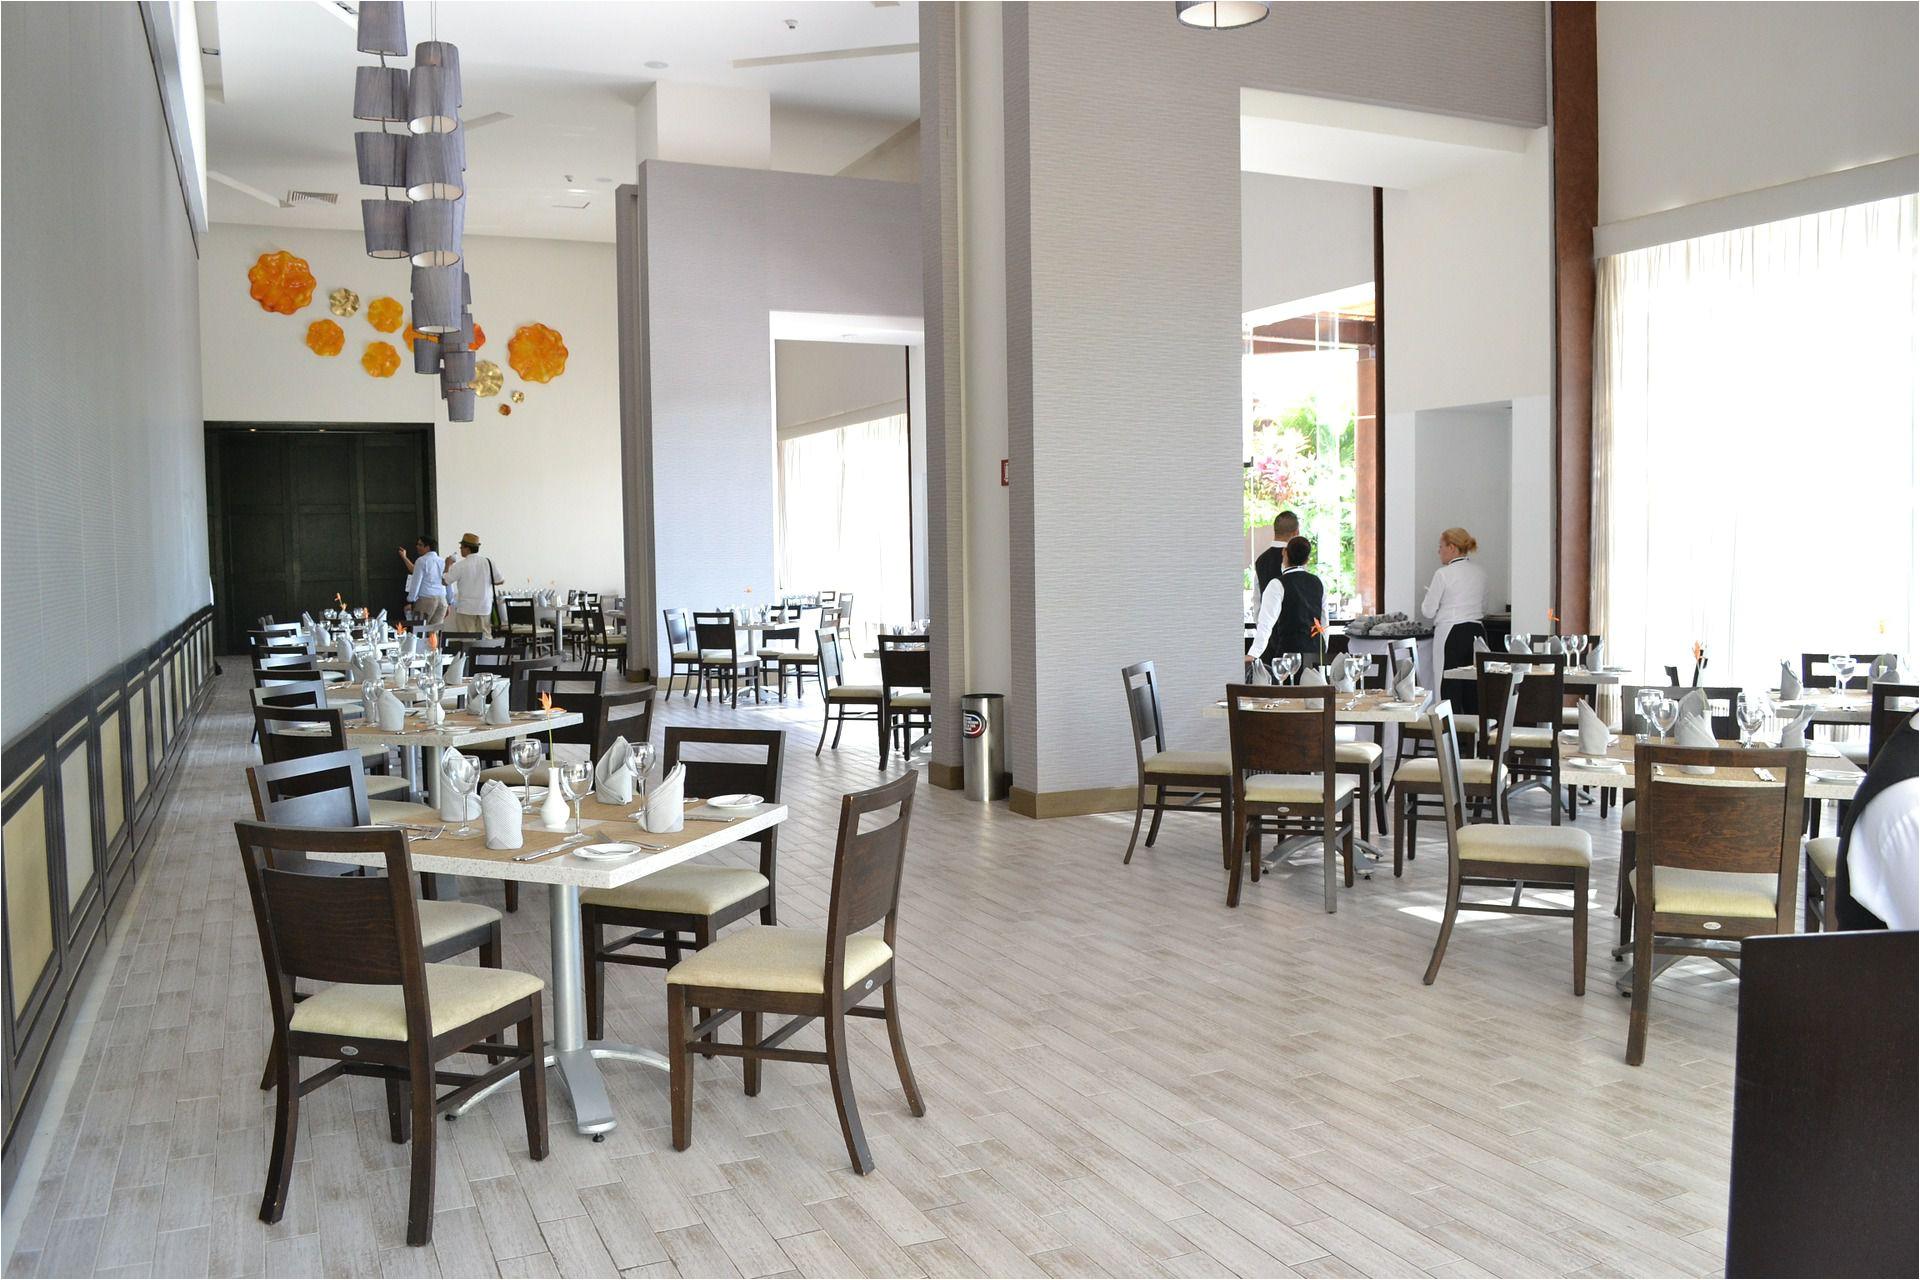 Restaurant Furniture 4 Less Reviews Adinaporter